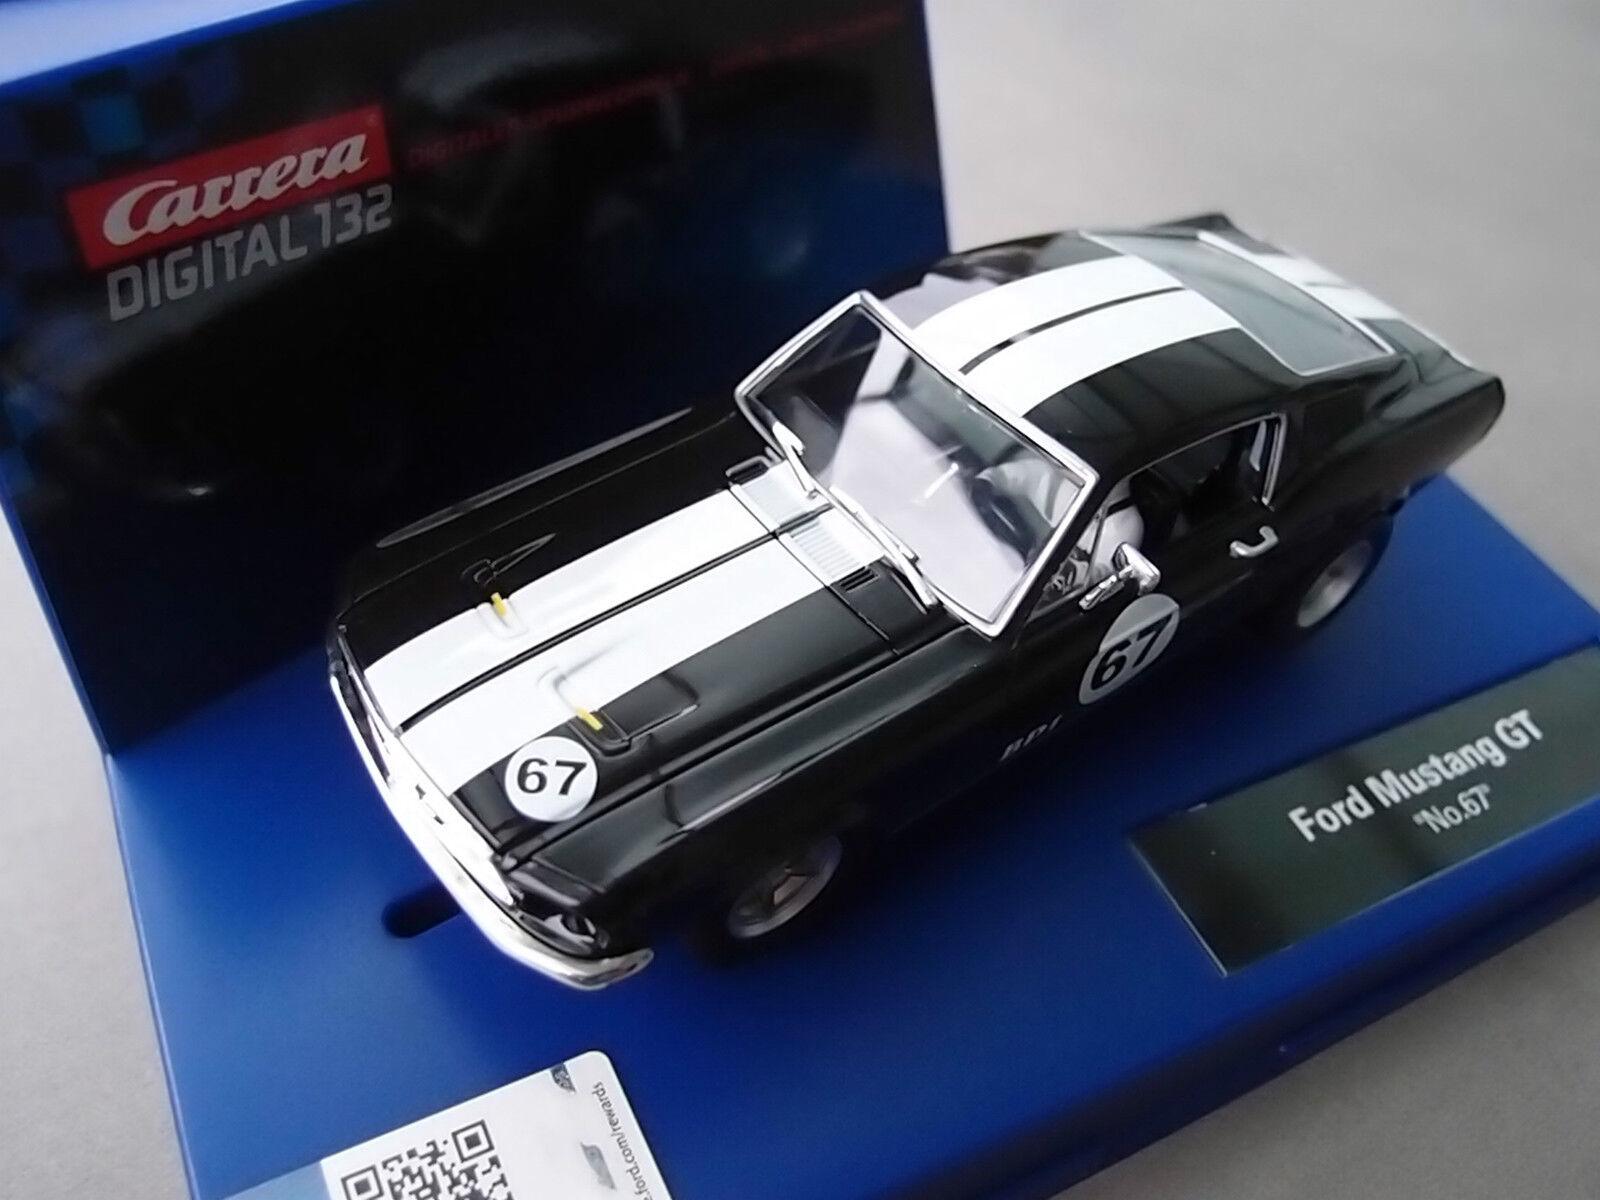 Carrera Digital 132 30670 Ford Mustang Gt 1967 LUCE USA